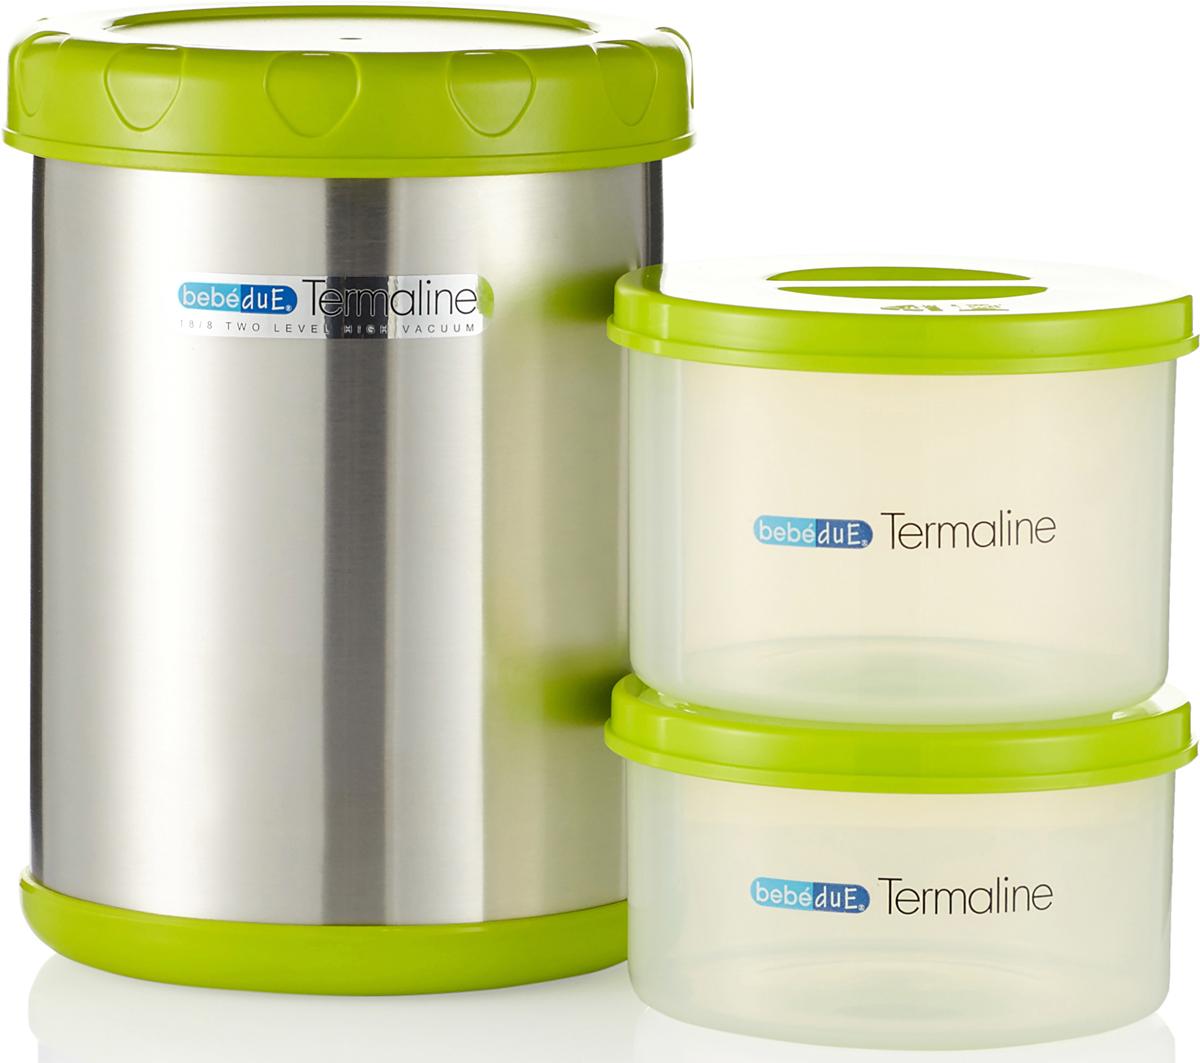 Bebe Due Термос с двумя резервуарами 1,1 л поильники bebe due чашка непроливайка bebe due medic